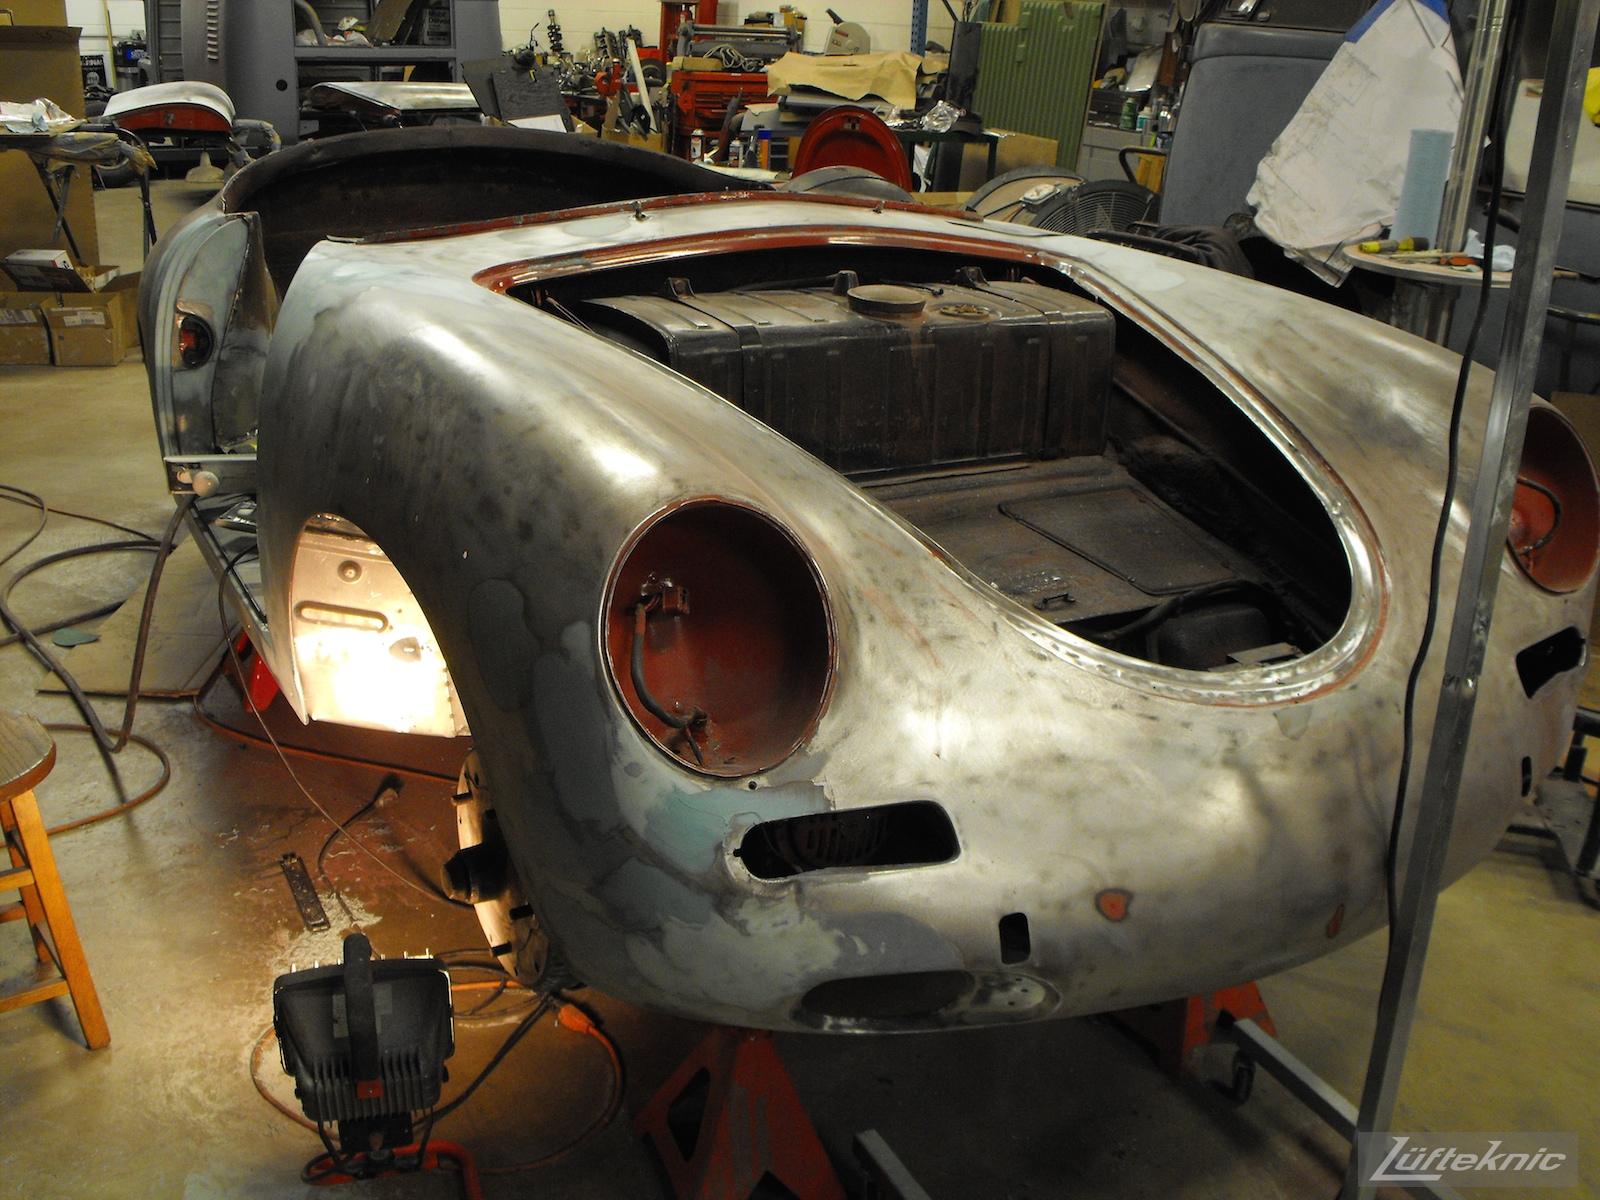 Front end view of a 1961 Porsche 356B Roadster restoration.